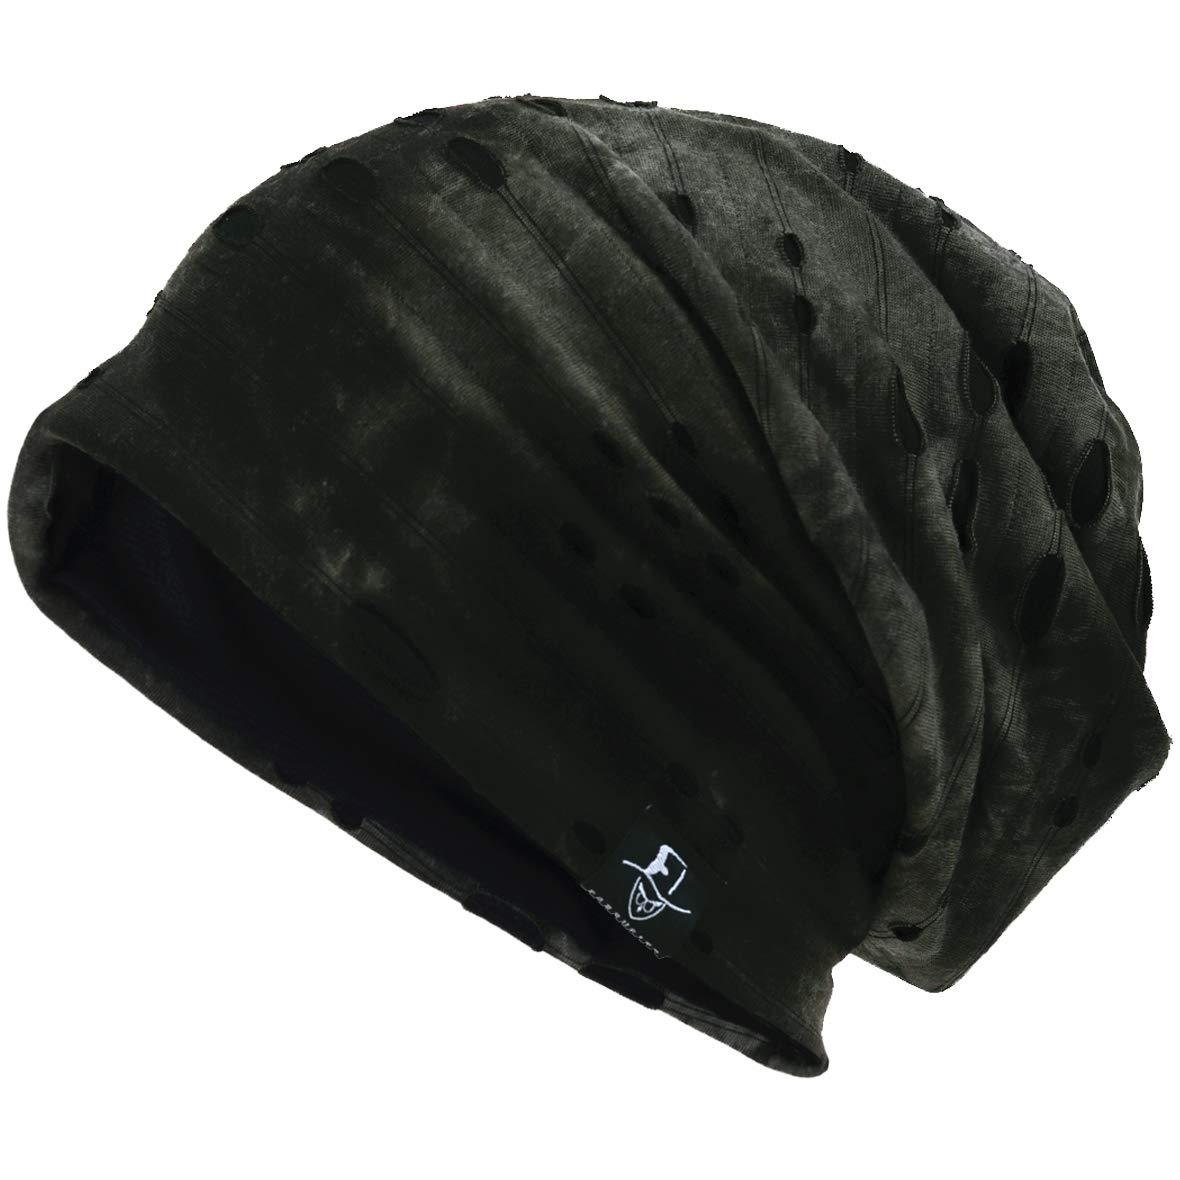 Hombre Jersey Slouch Gorro Verano Skullcap